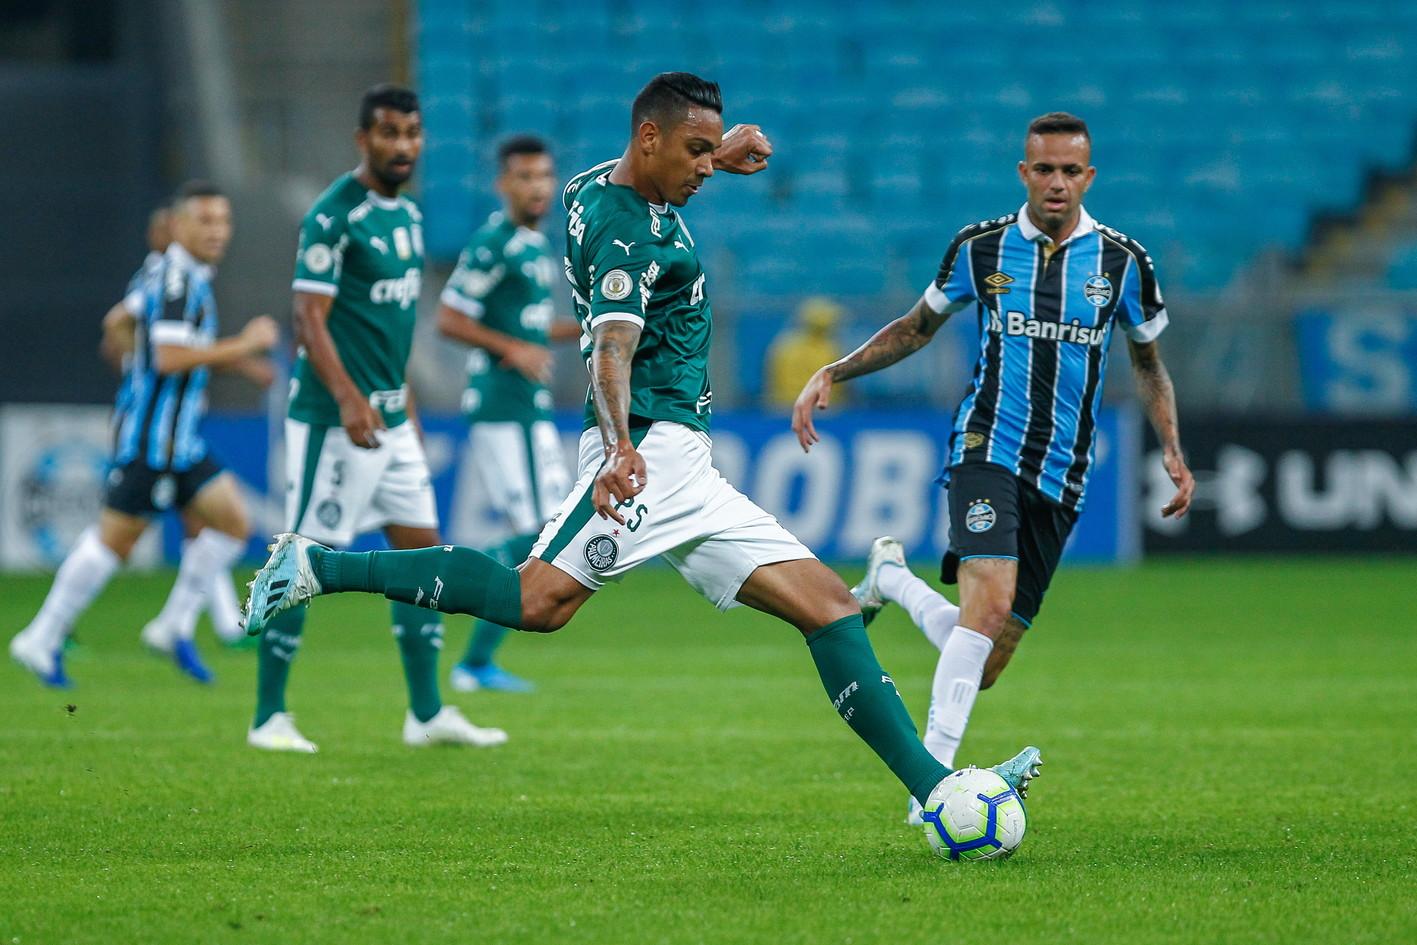 Matheus Fernandes dal Palmeiras al Barcellona per 7 milioni